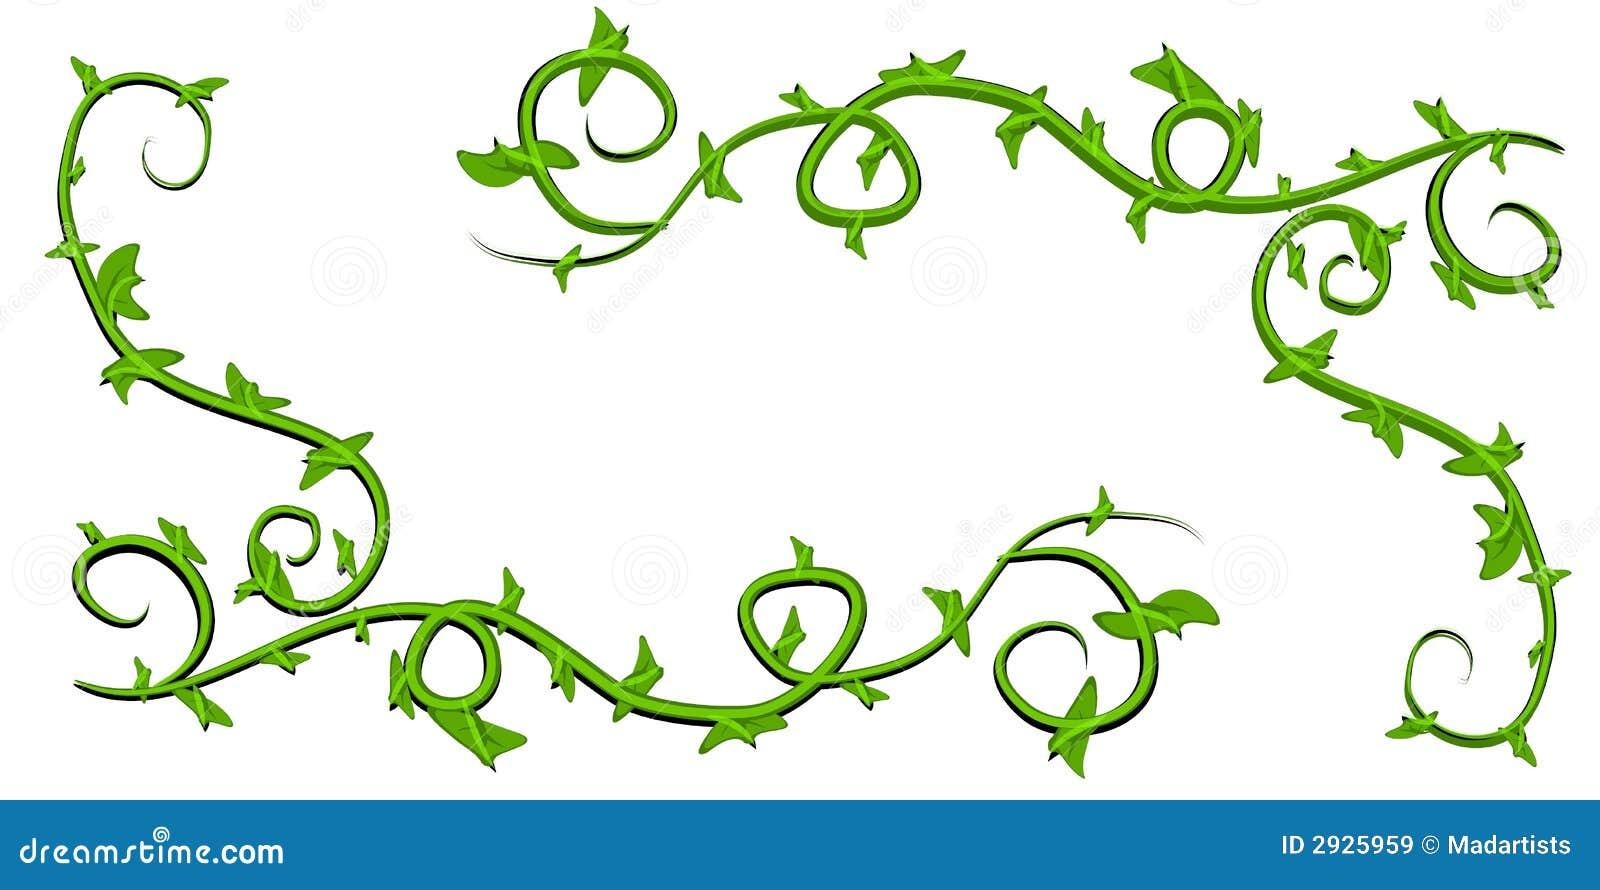 green leafy vines clip art stock illustration illustration of rh dreamstime com clip art vines on letters clip art vines and fruit